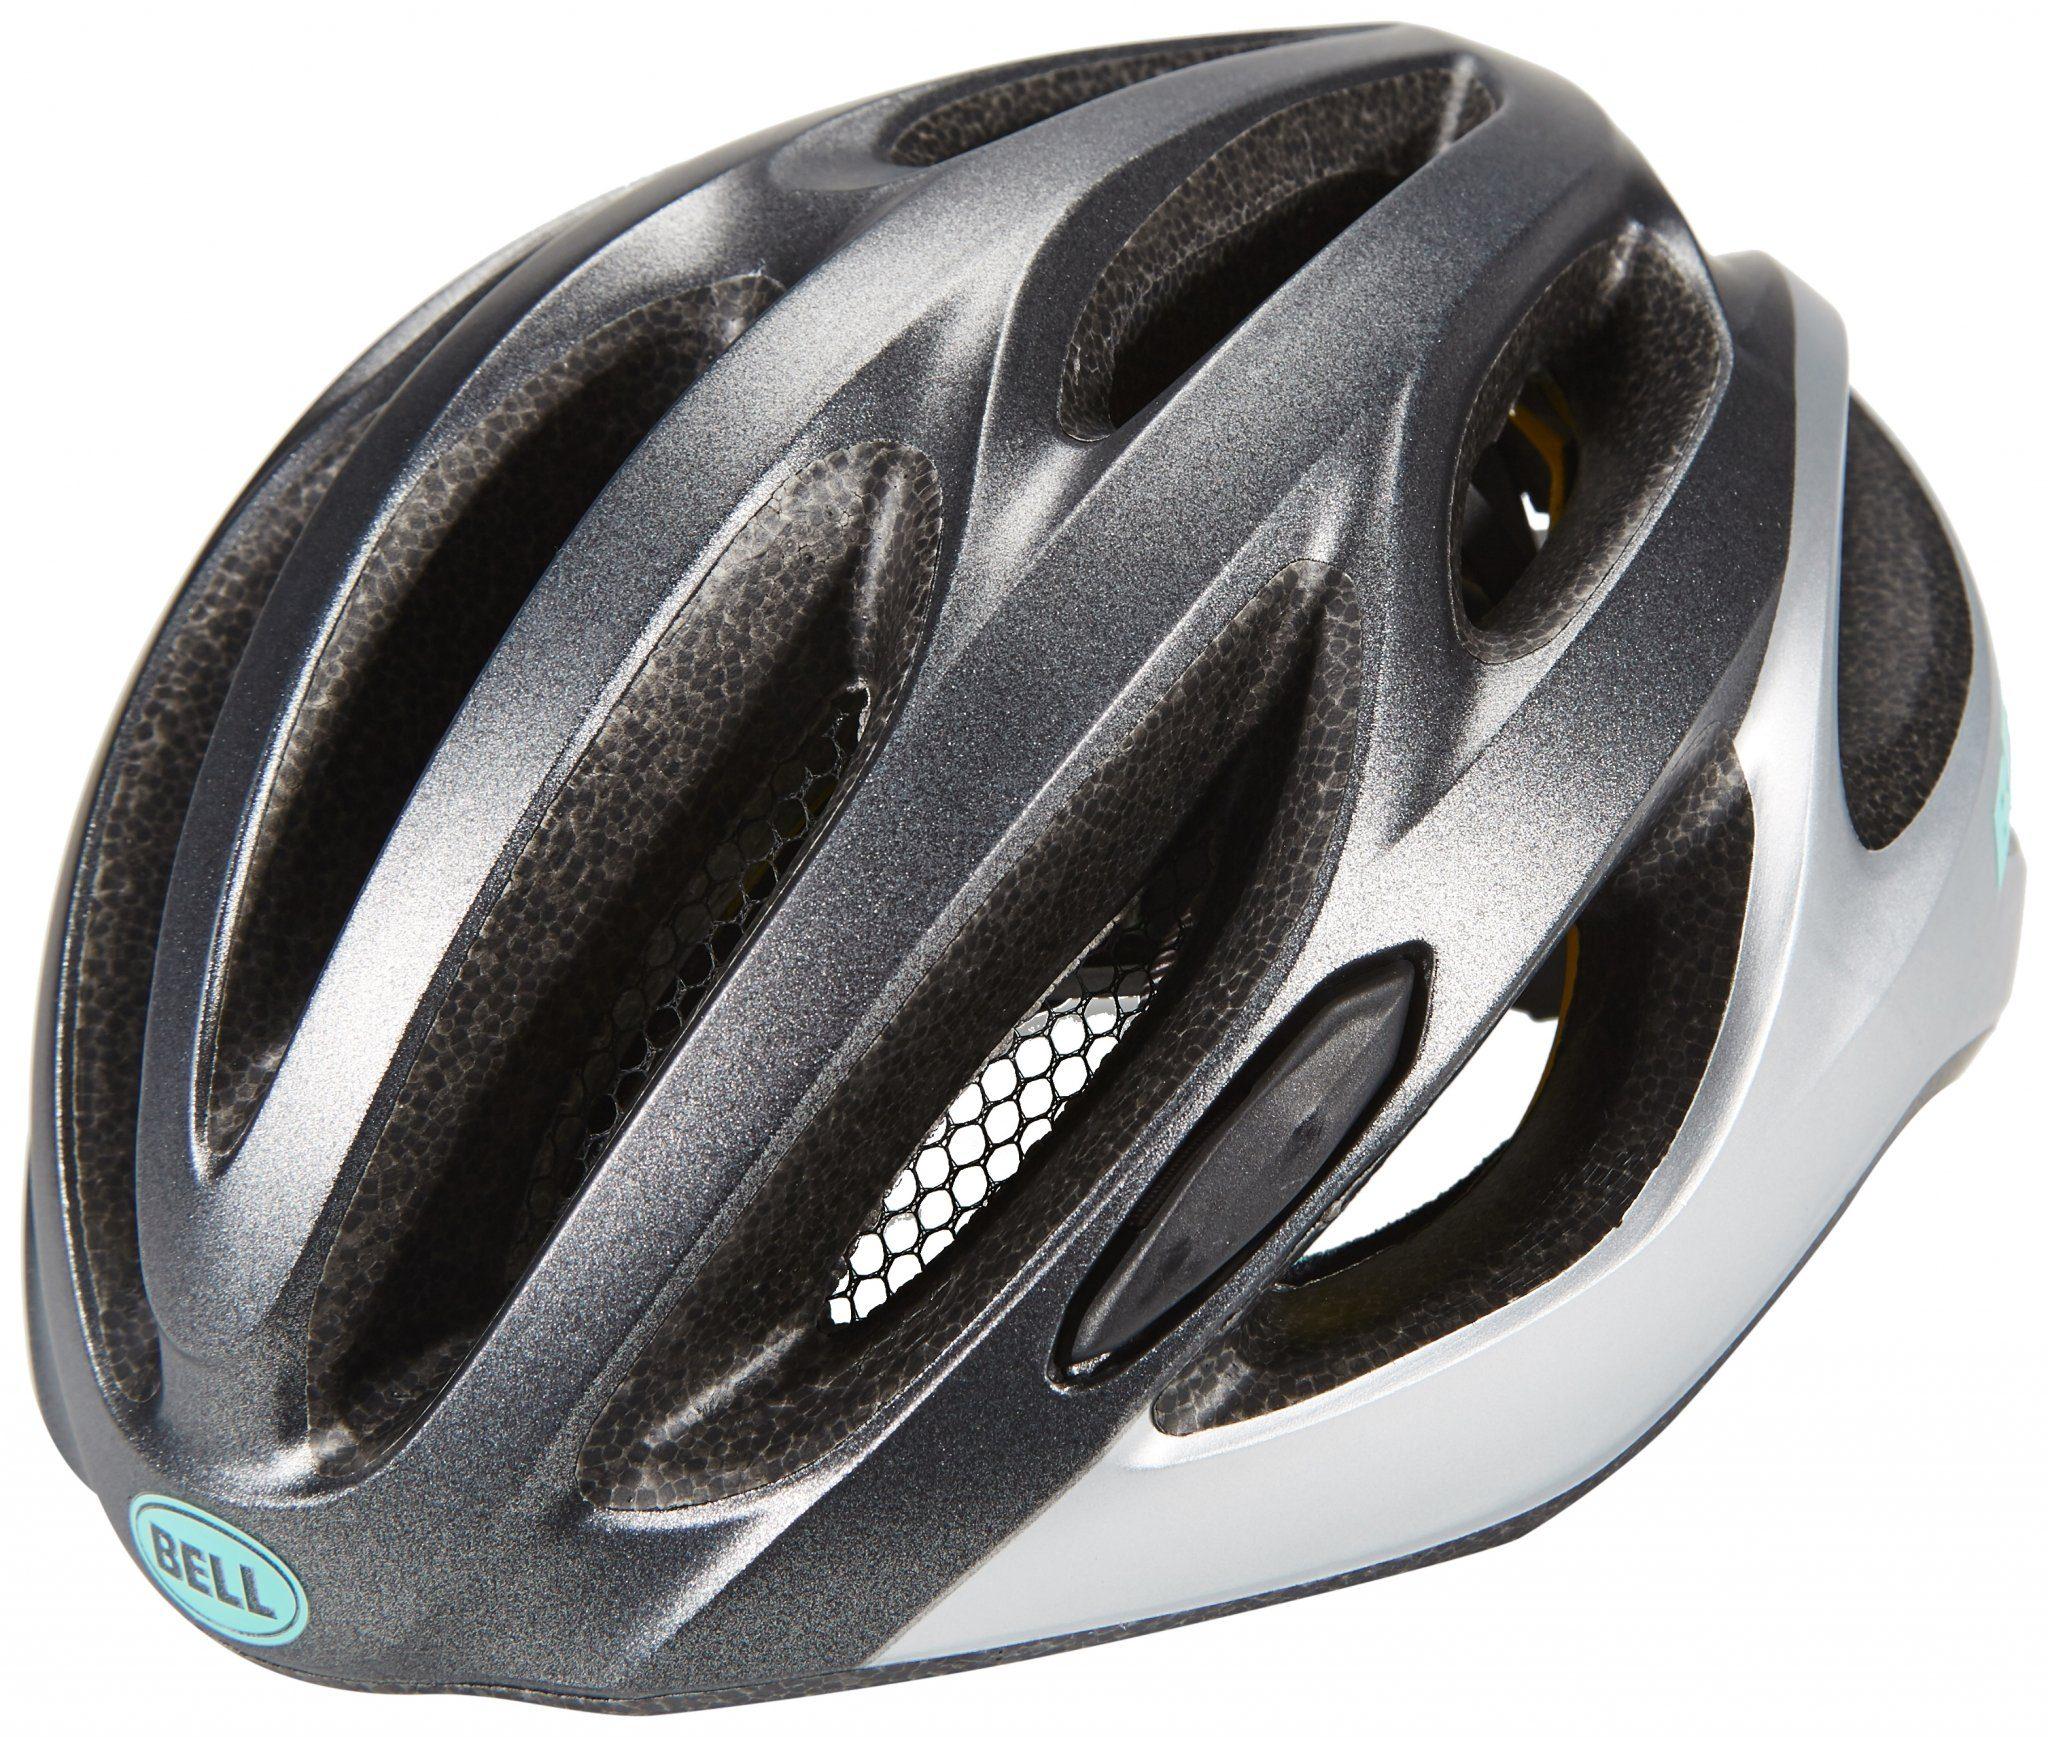 Bell Fahrradhelm »Tempo MIPS Helmet Unisize Women«